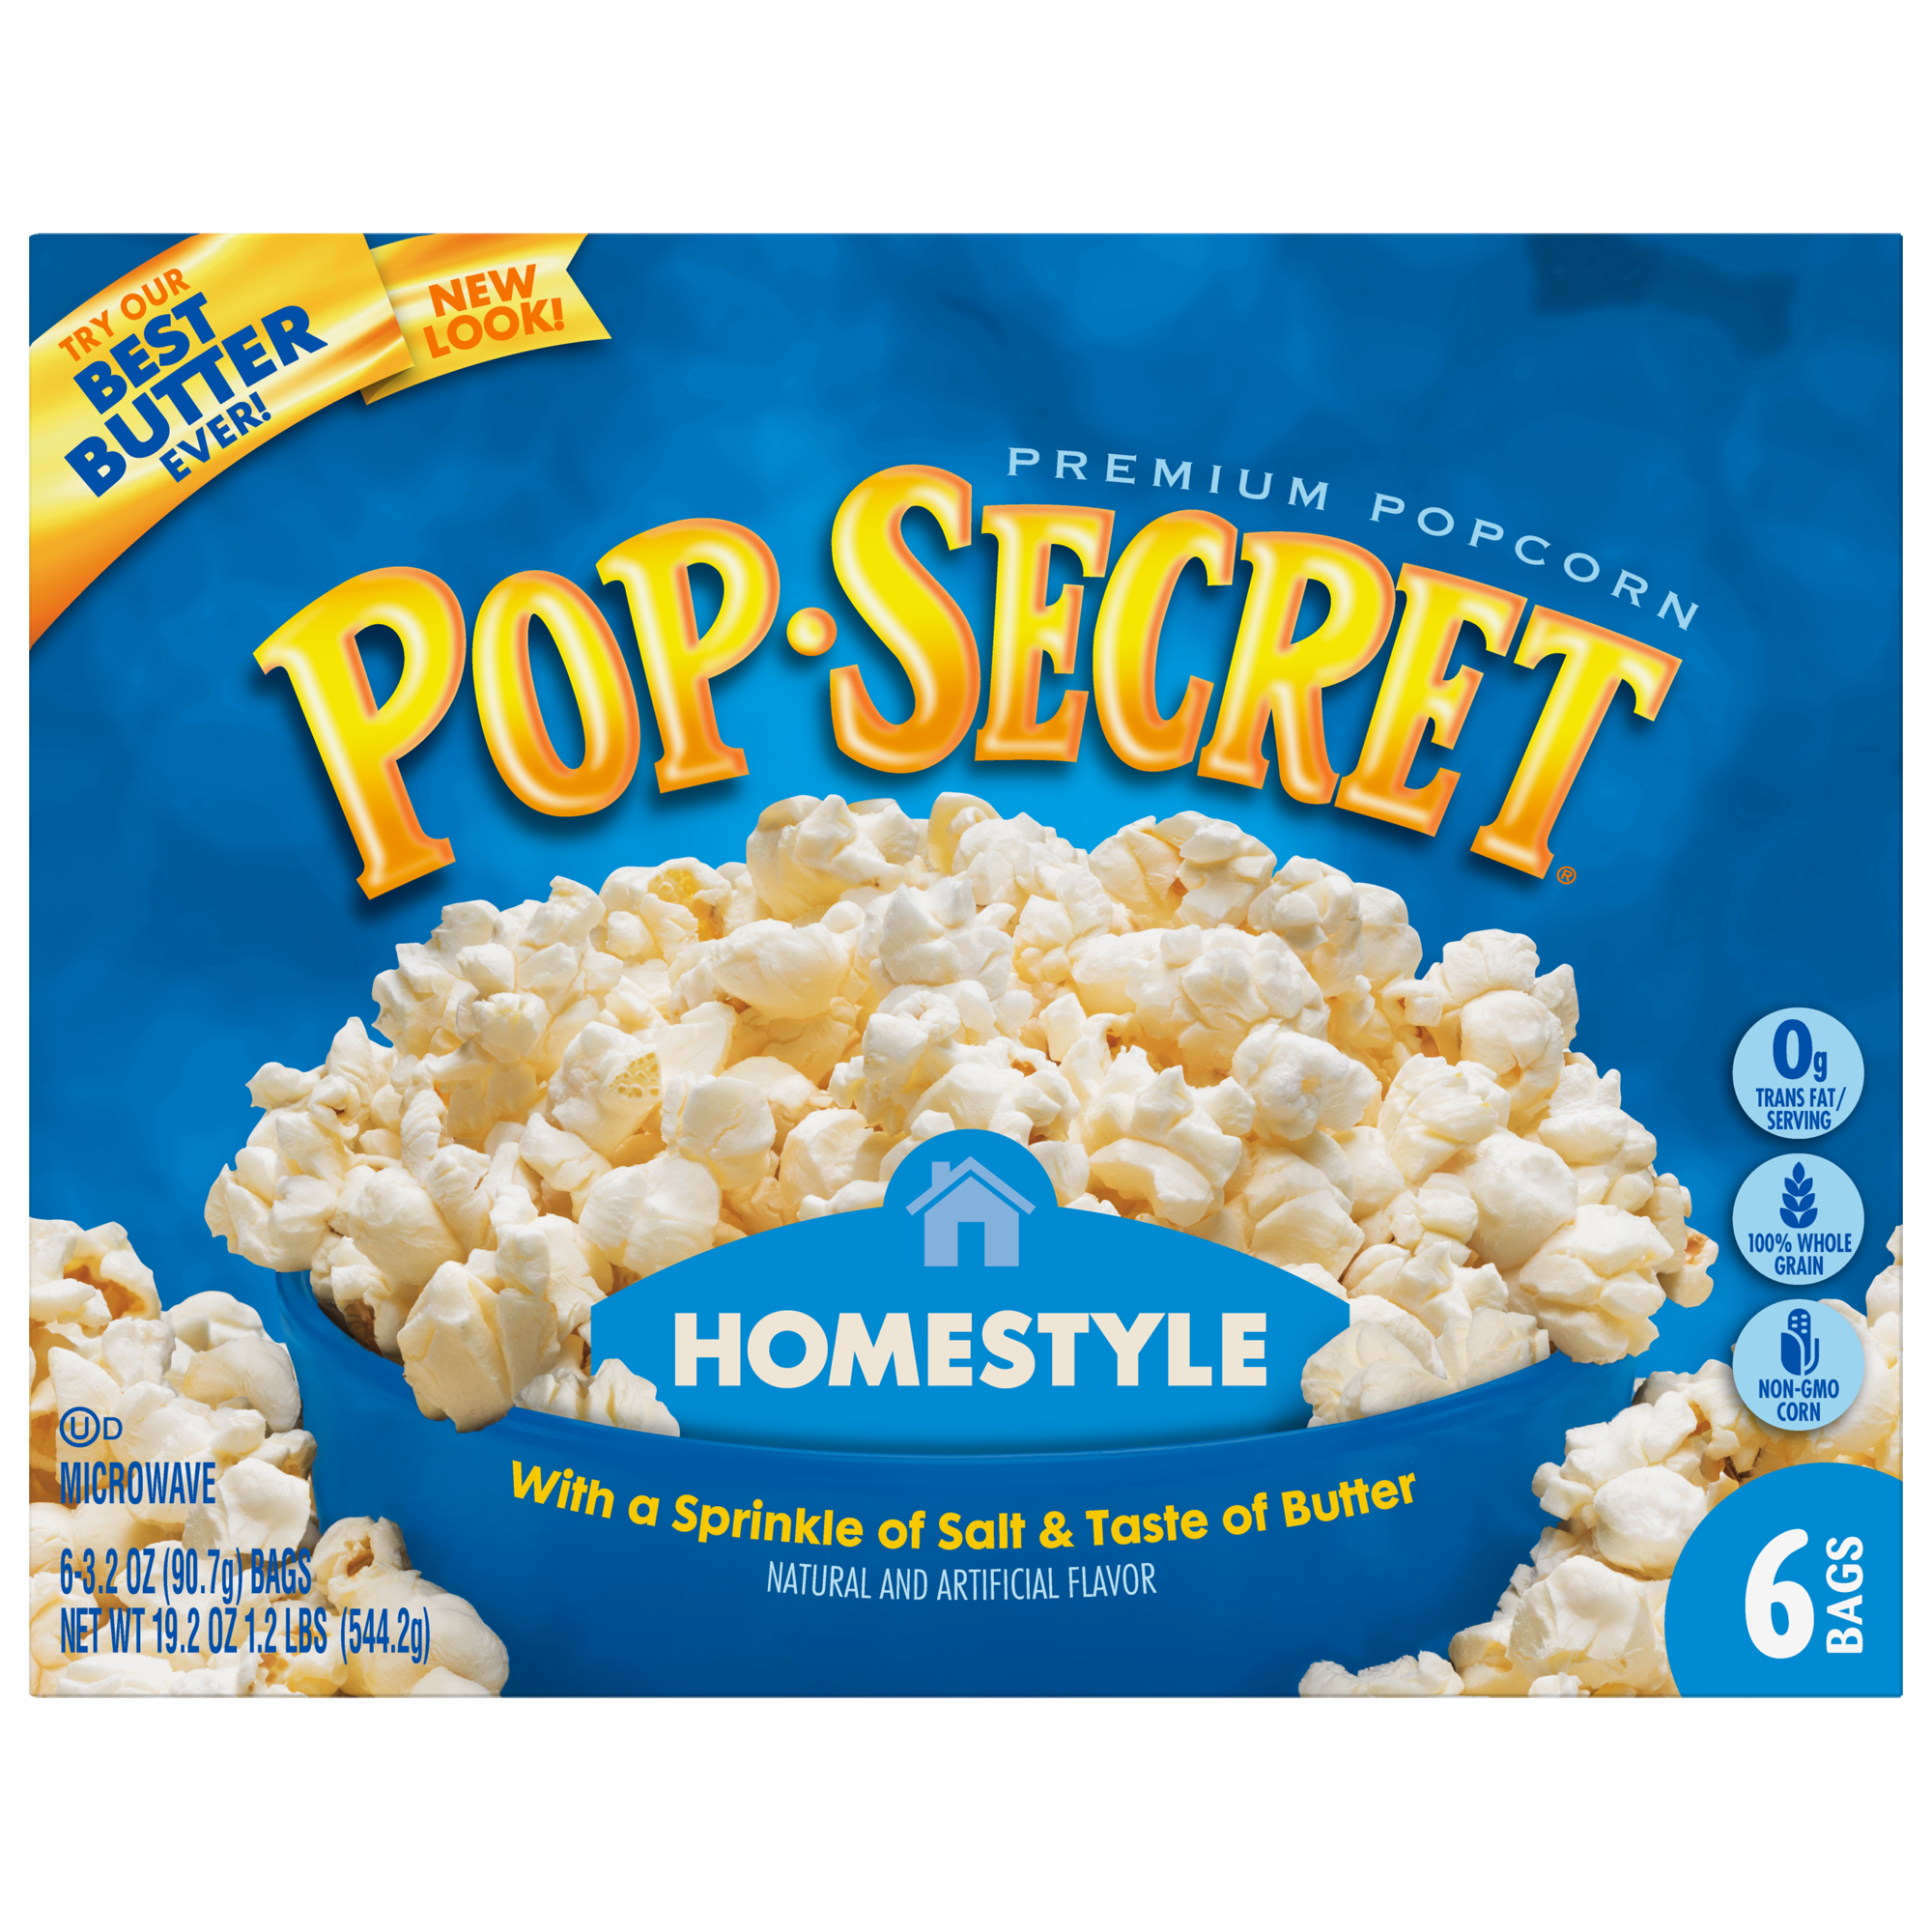 (3 Pack) Pop Secret Microwave Popcorn, Homestyle, 3.2 Oz, 6 Ct